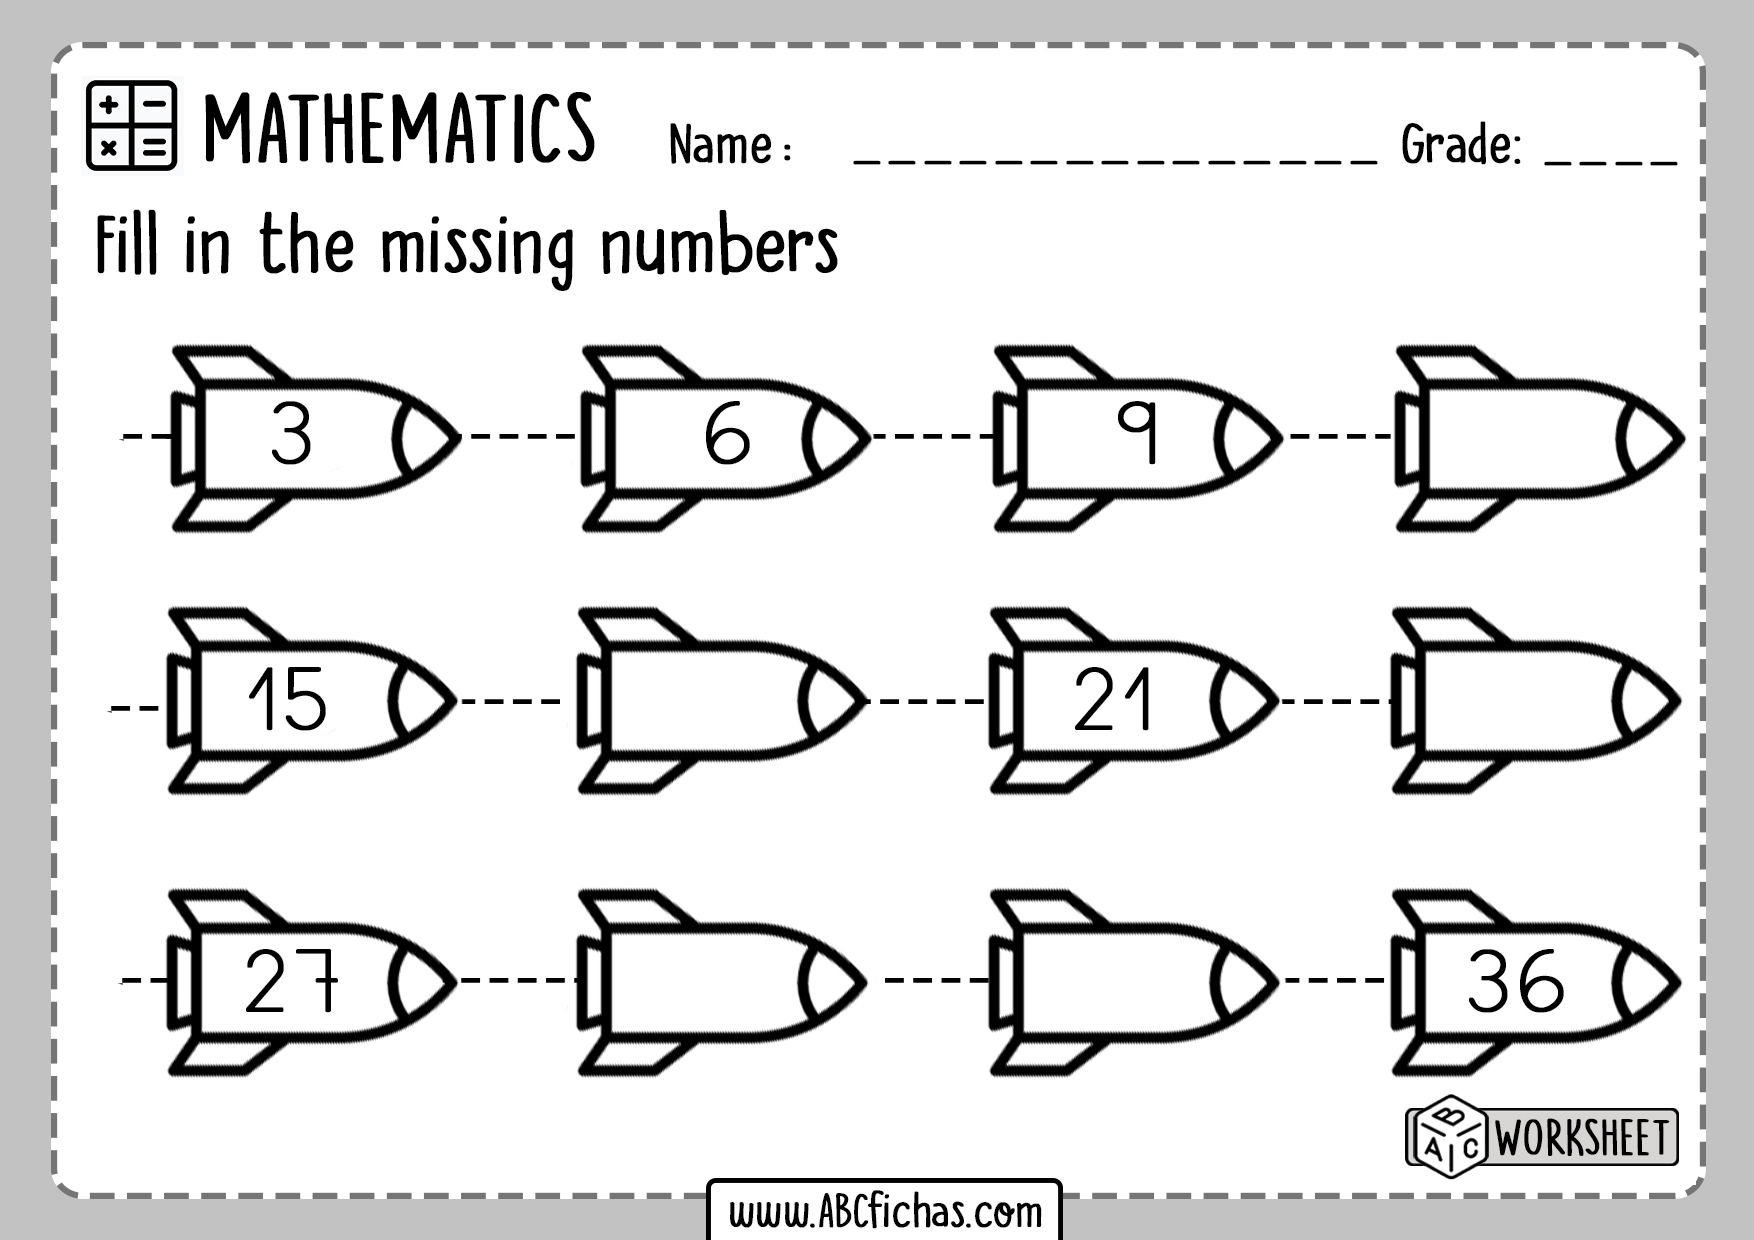 Number Sequence Worksheet